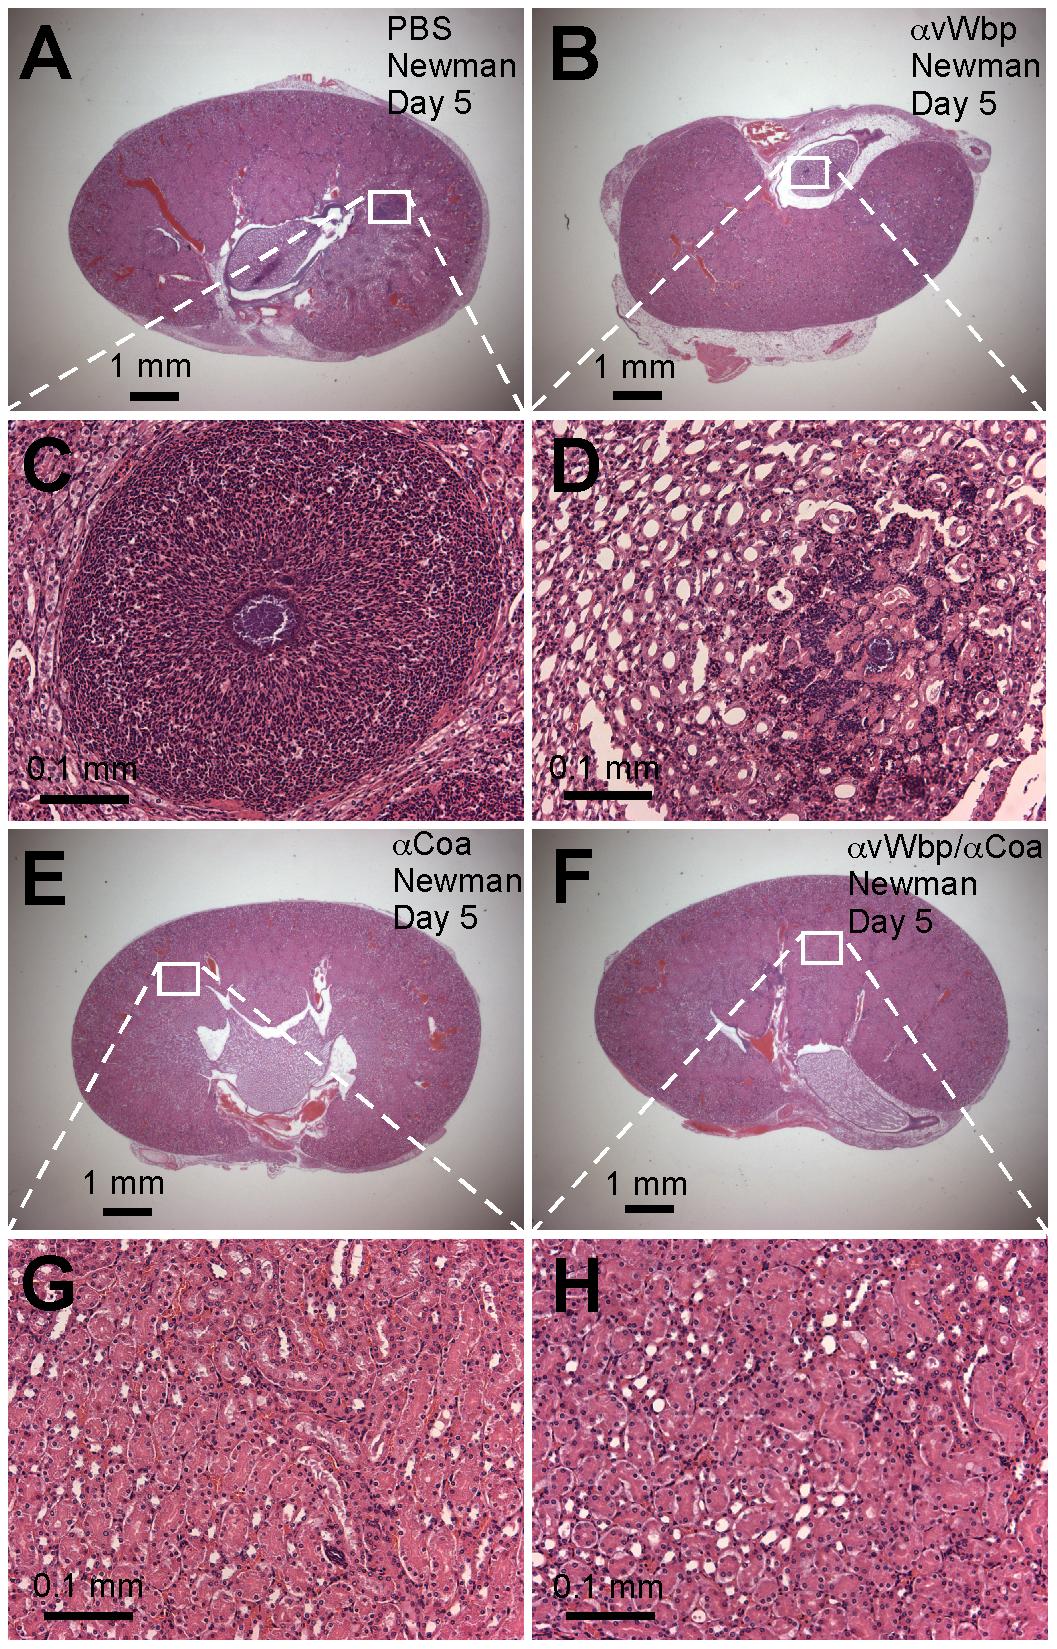 Passive transfer of coagulase antibodies confers protection against <i>S. aureus</i> abscess formation.